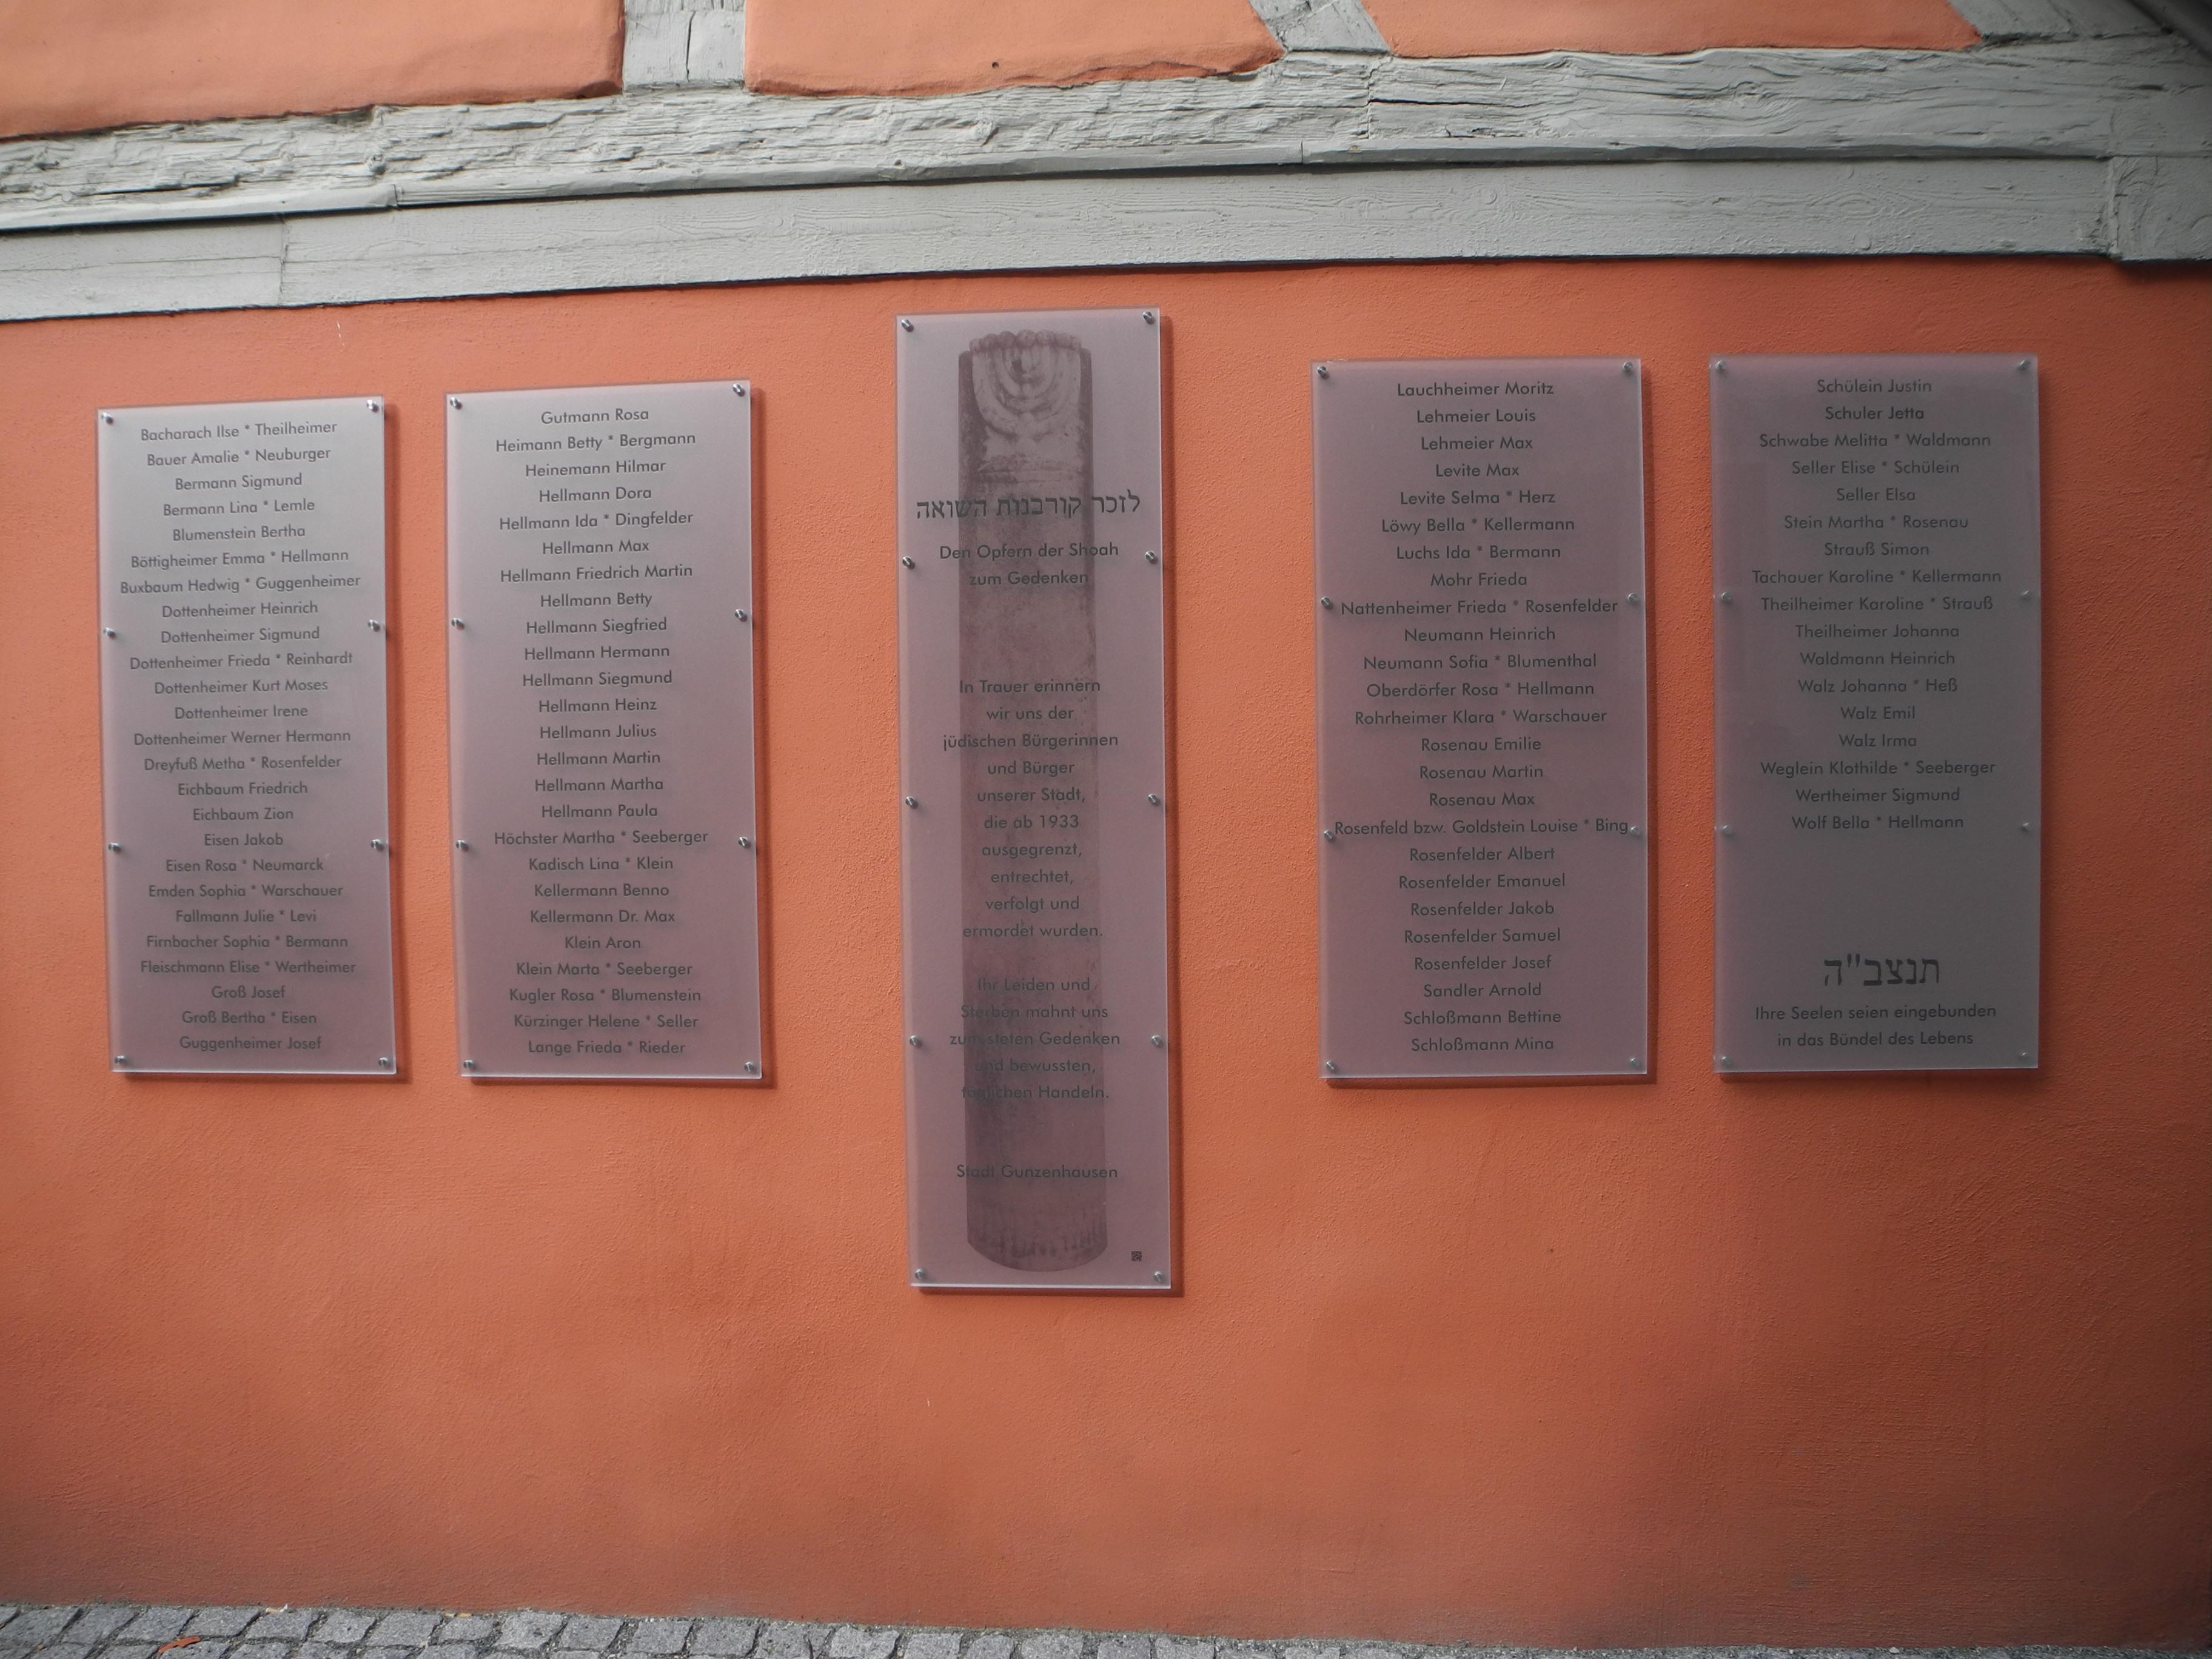 http://jl-gunzenhausen.de/files/vision/img/Volksschule/DSCN3473.JPG